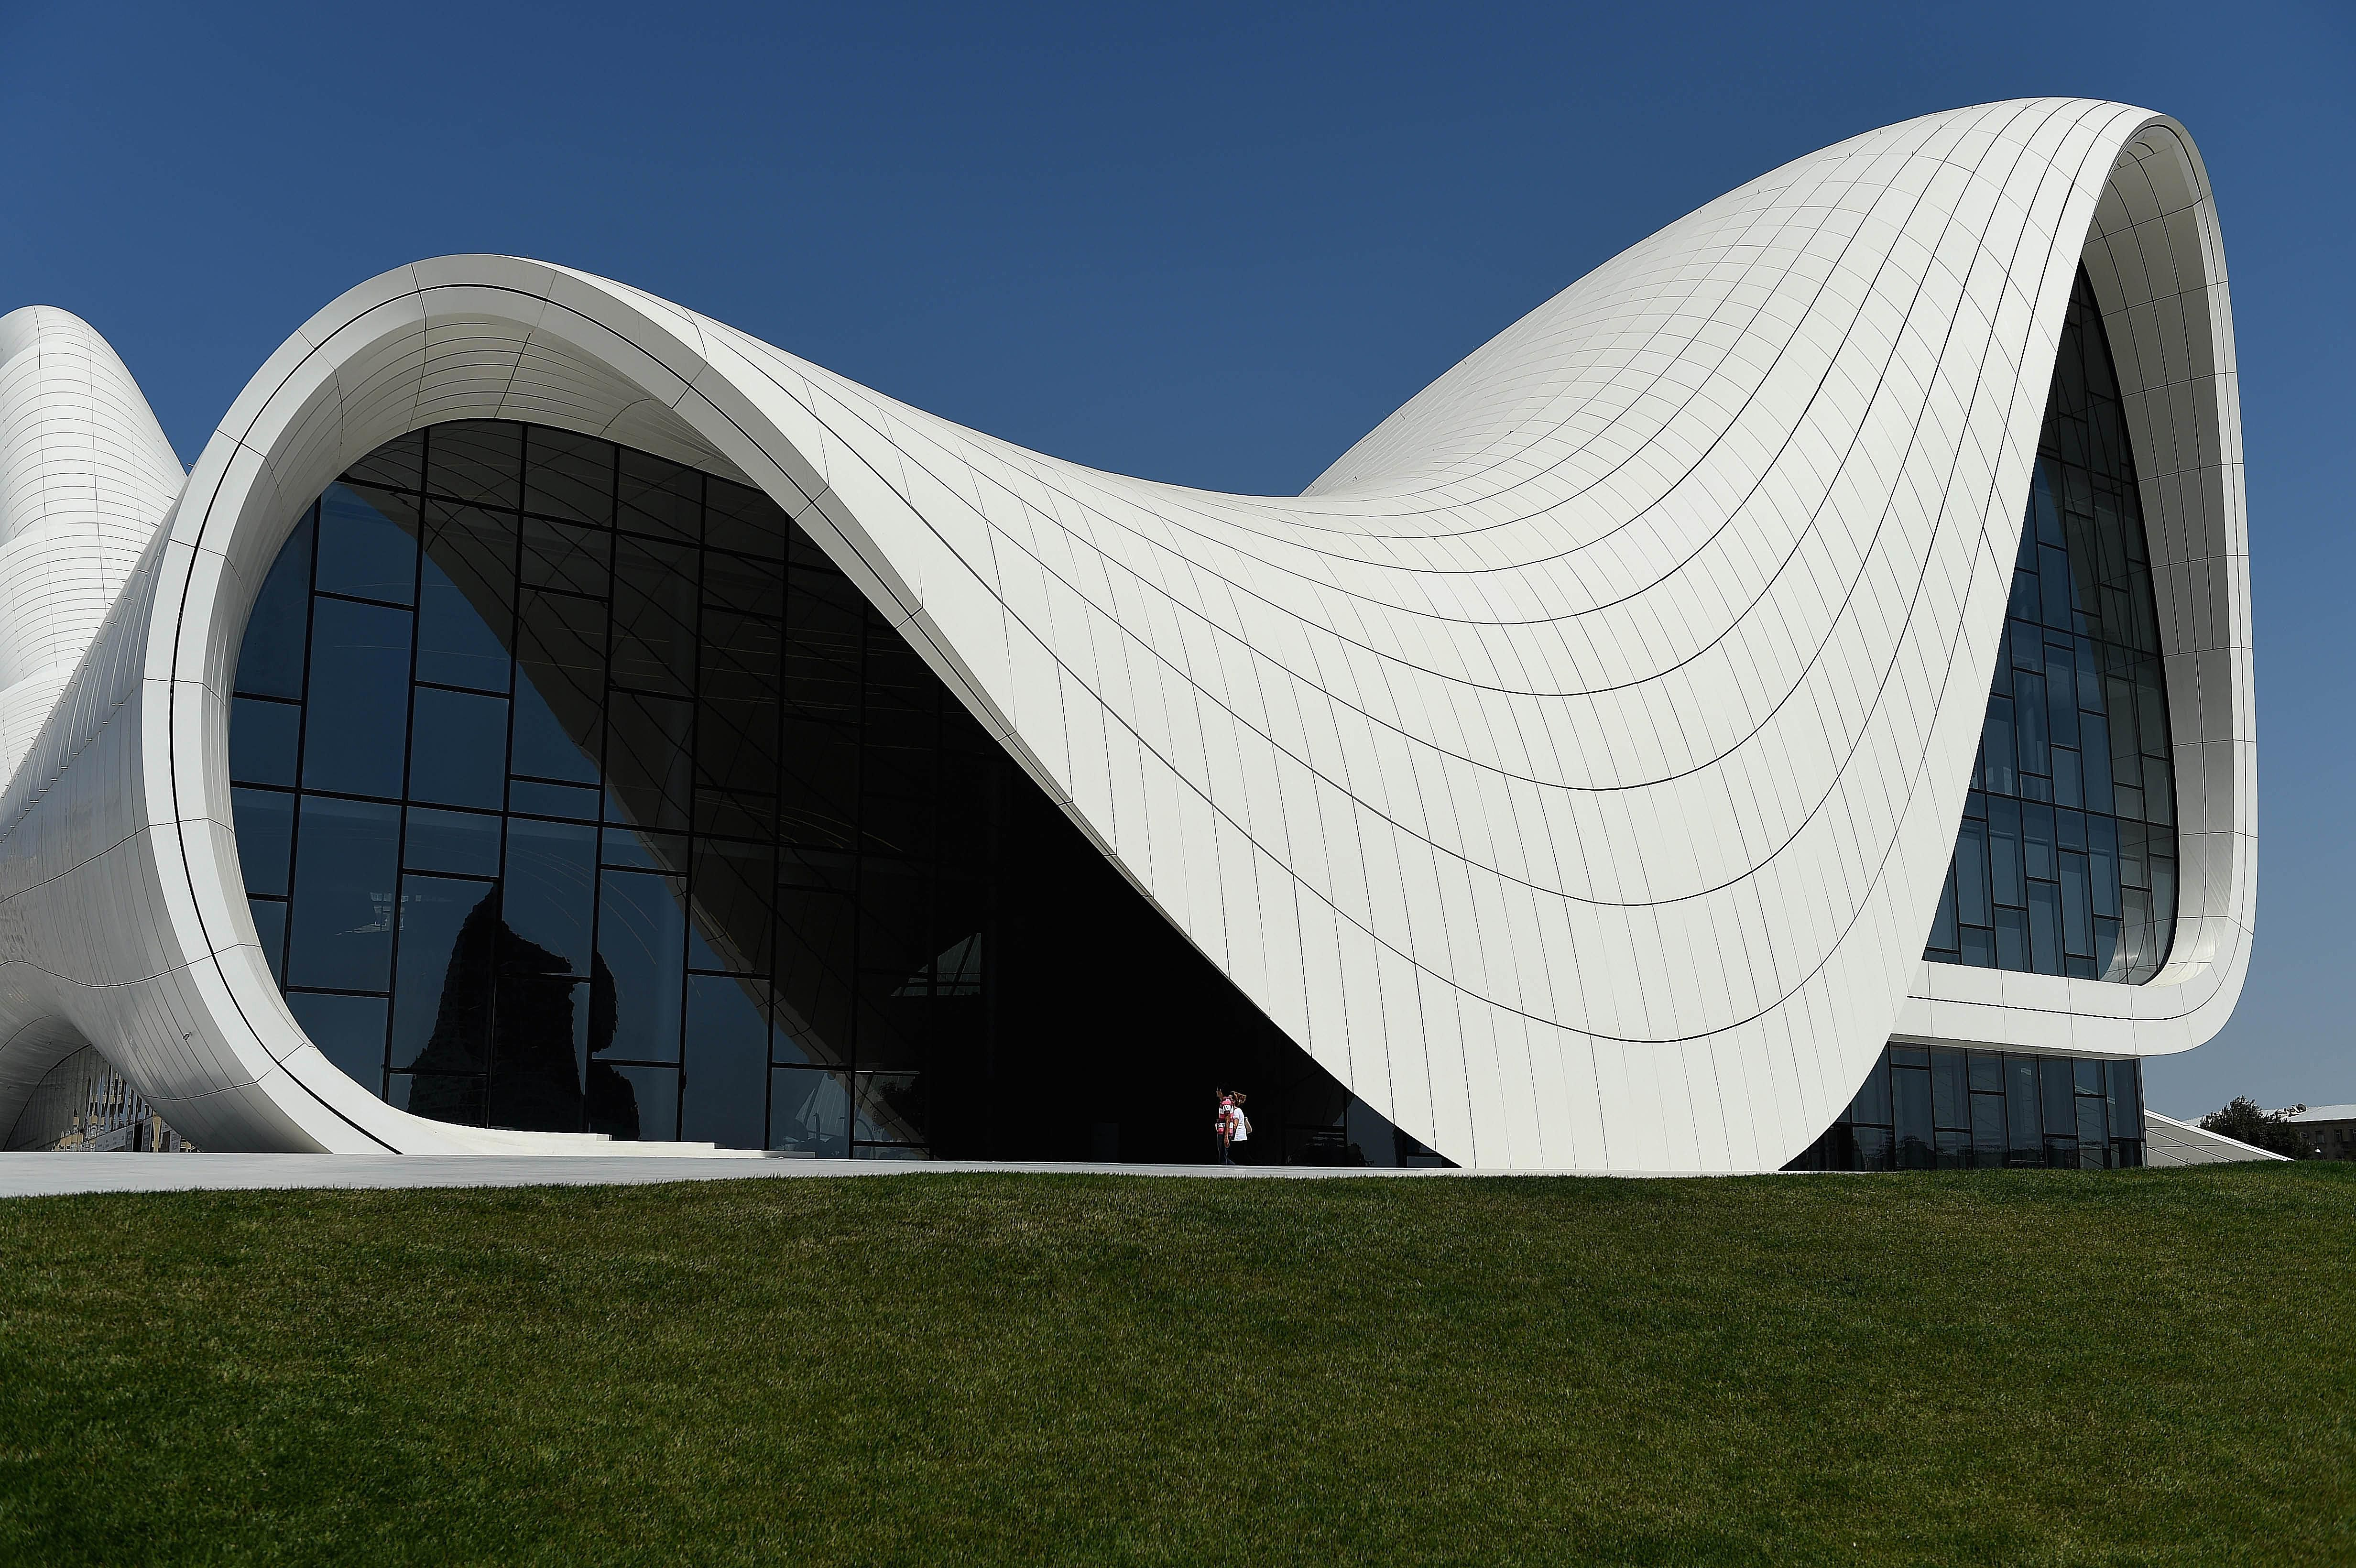 Curving Computer-designed Parametricism of Zaha Hadid's Heydar Aliyev Centre, 2012, Baku, Azerbaijan